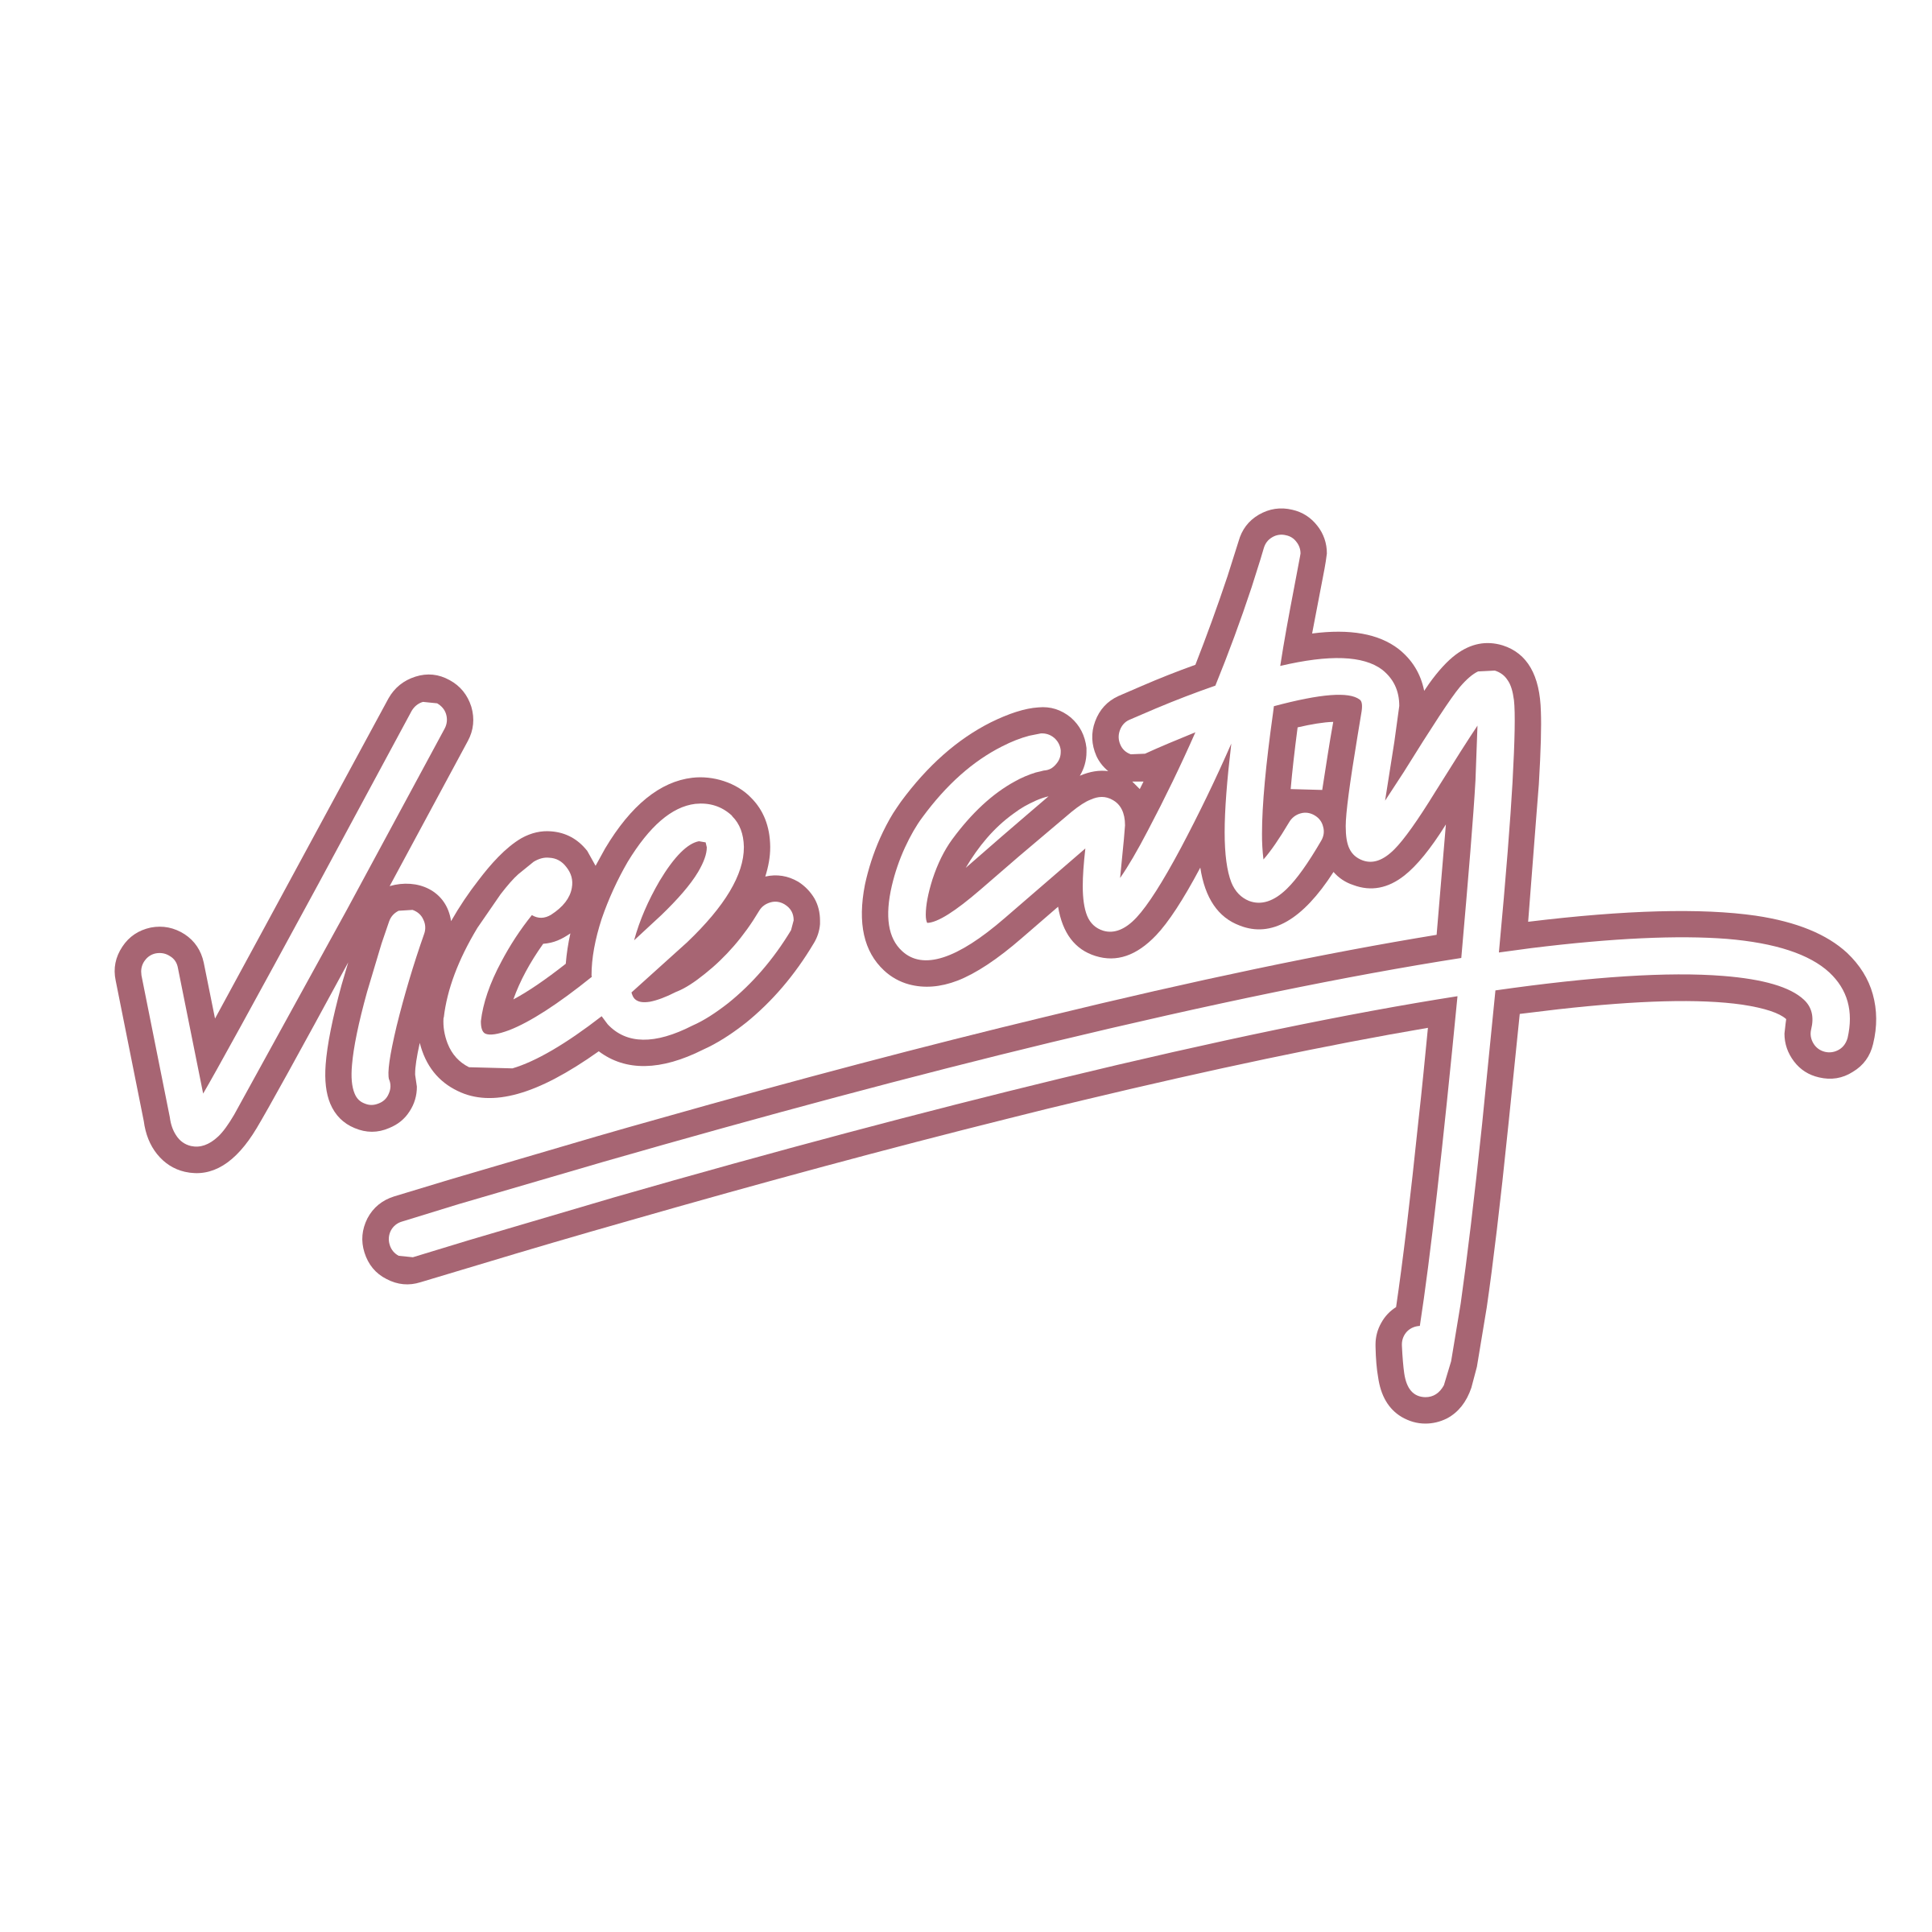 GTA Vice City Logo PNG Transparent & SVG Vector.